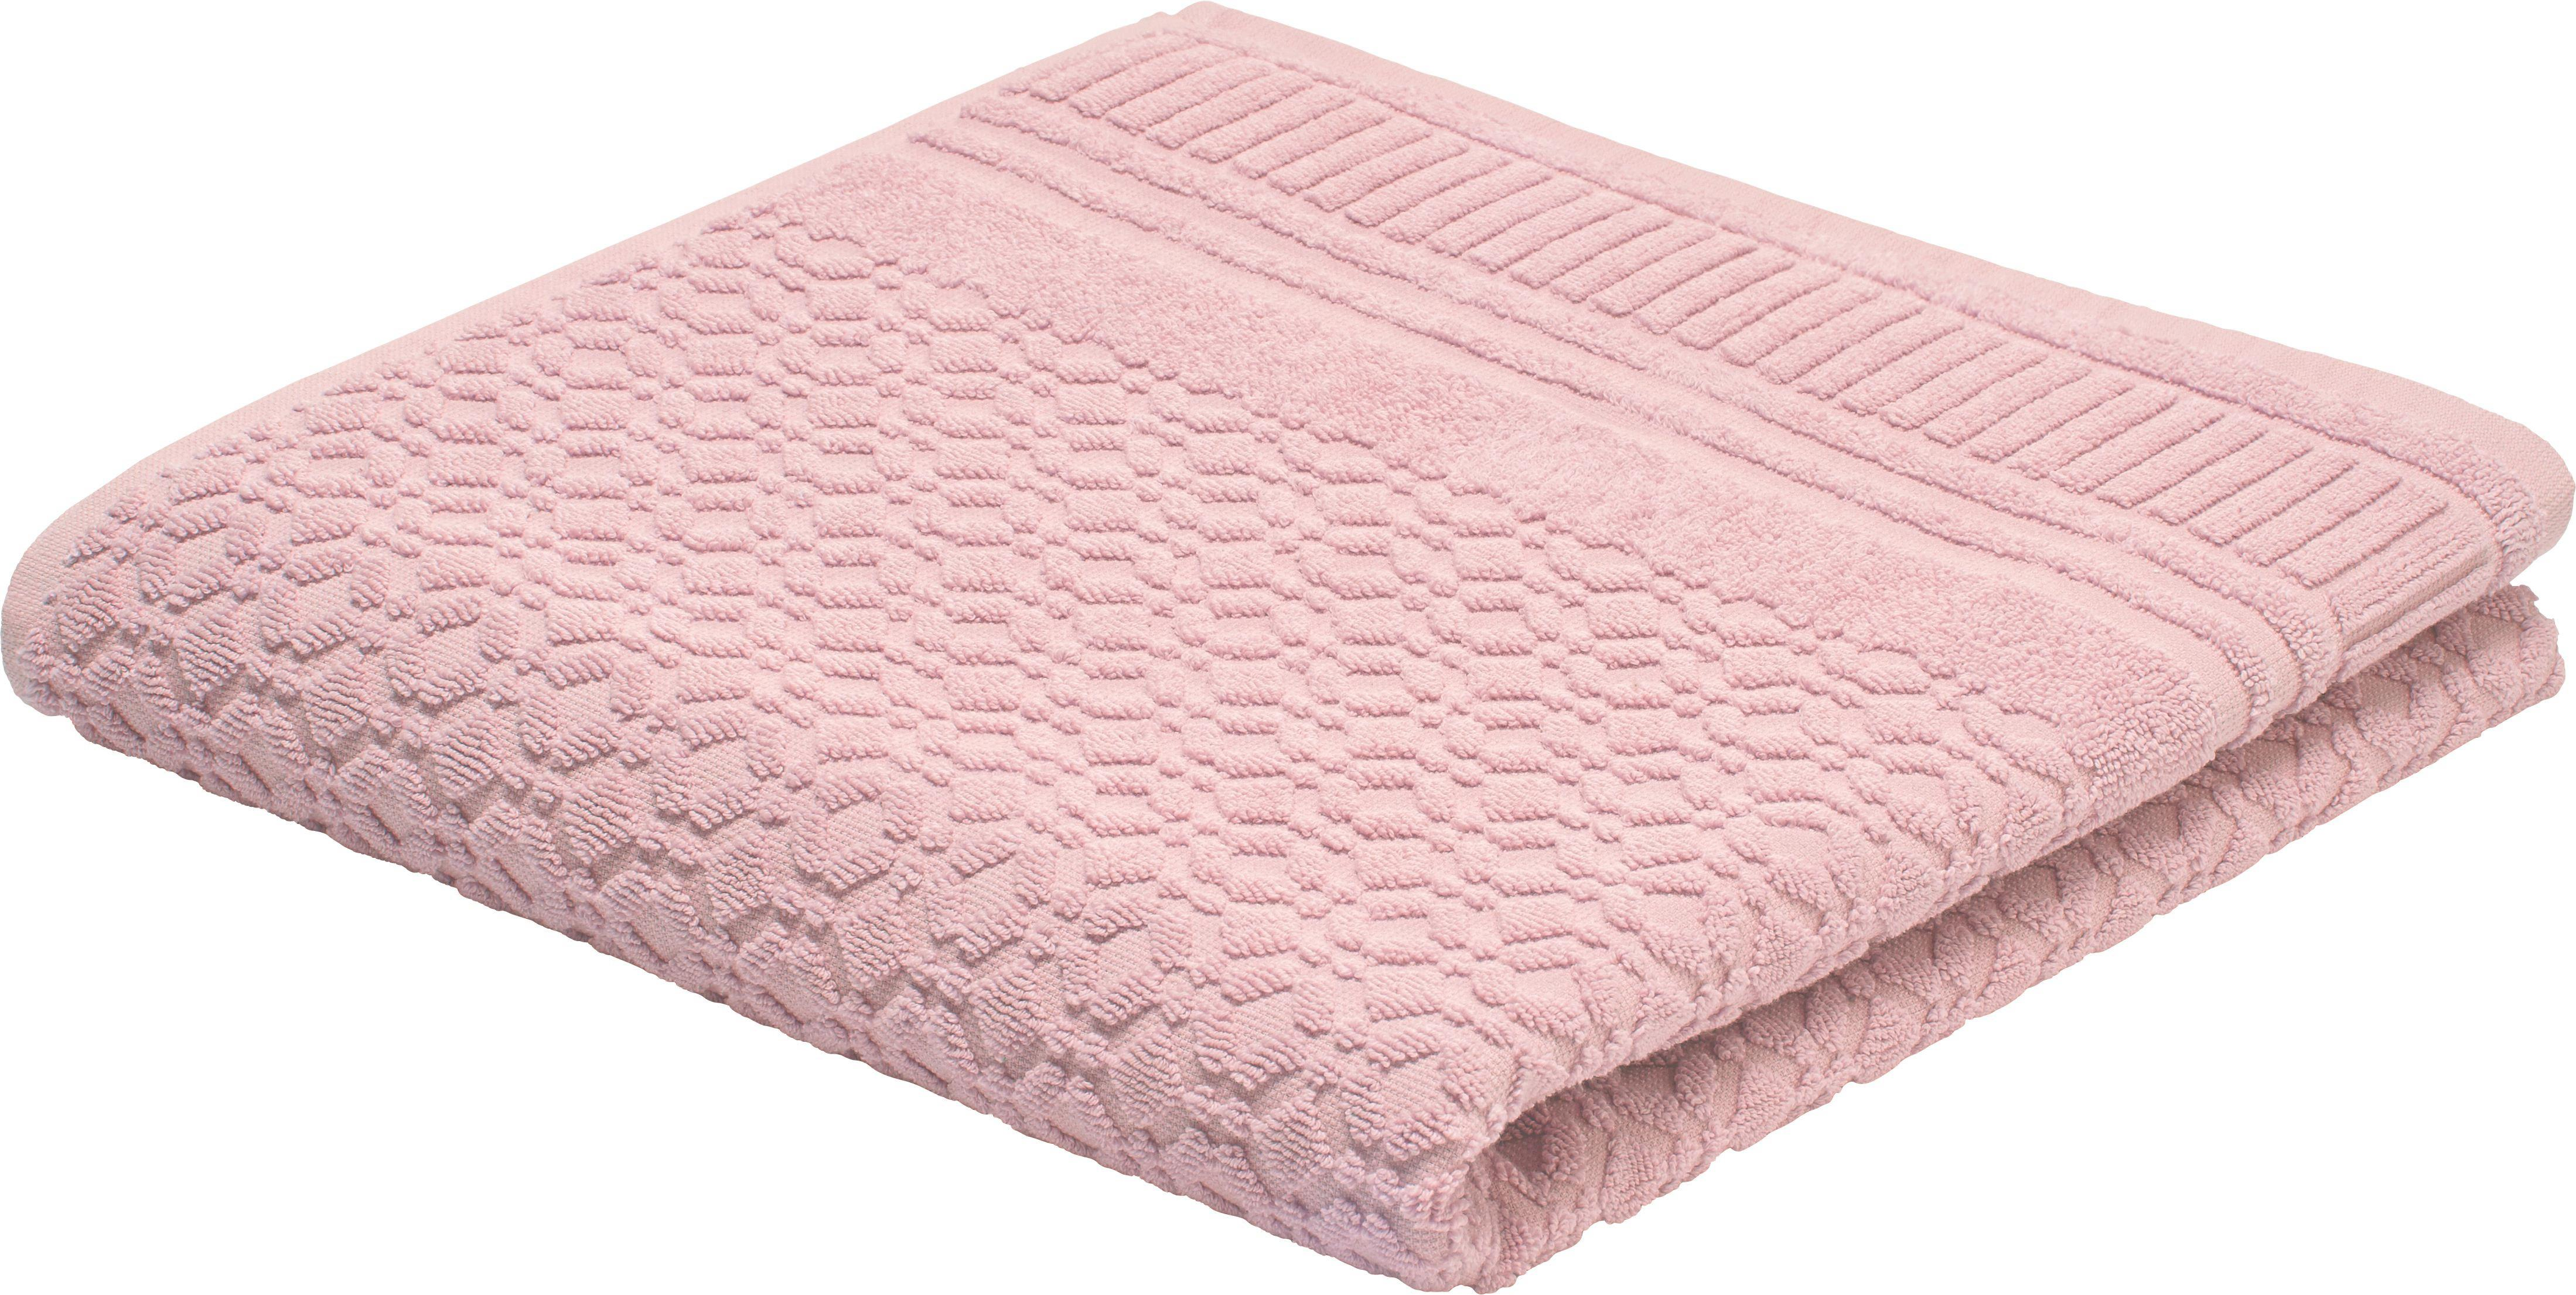 Duschtuch Carina in Rosa - Rosa, ROMANTIK / LANDHAUS, Textil (70/140cm) - MÖMAX modern living